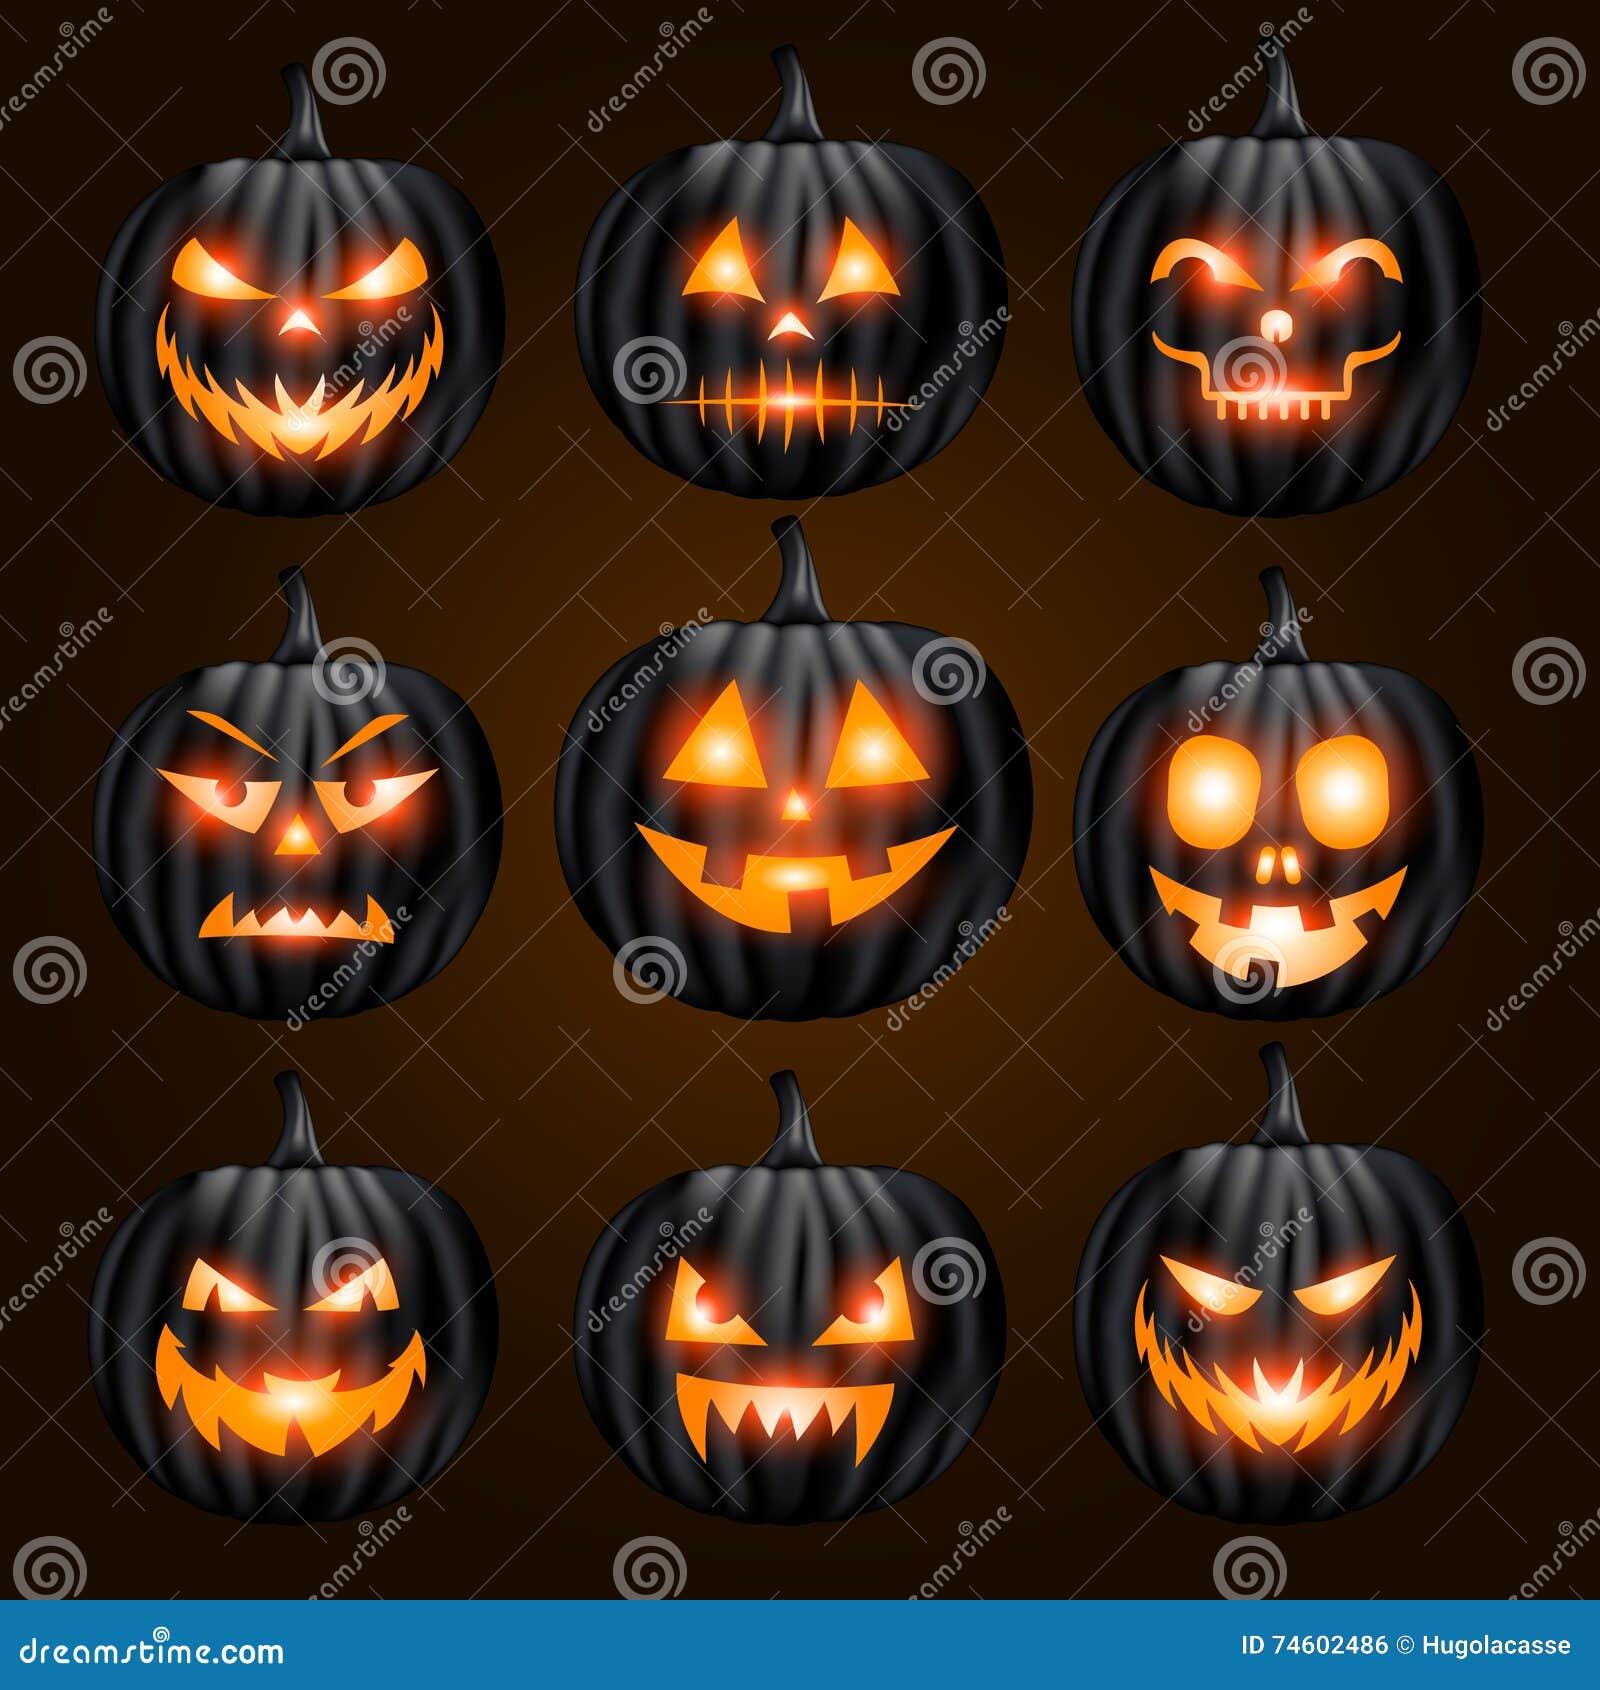 jack o lantern pumpkin faces glowing on black background stock rh dreamstime com halloween pumpkin face templates funny pu